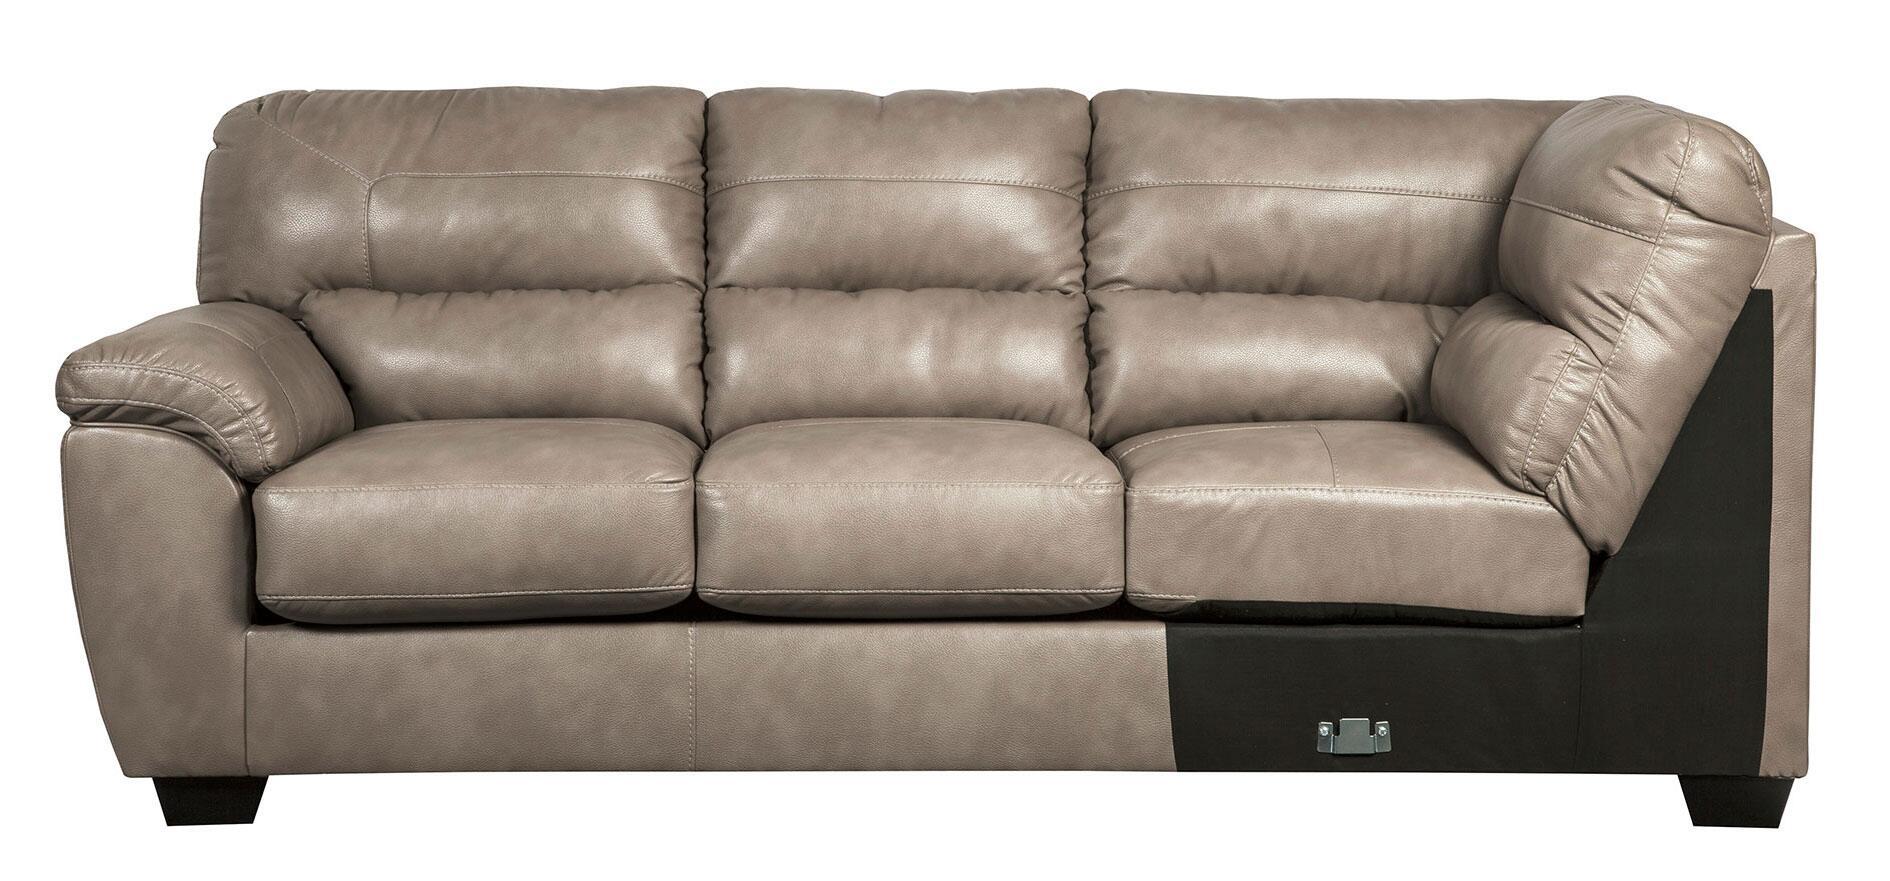 left arm return sofa harris tweed sofas john lewis benchcraft 97106564666 parkstown series stationary faux